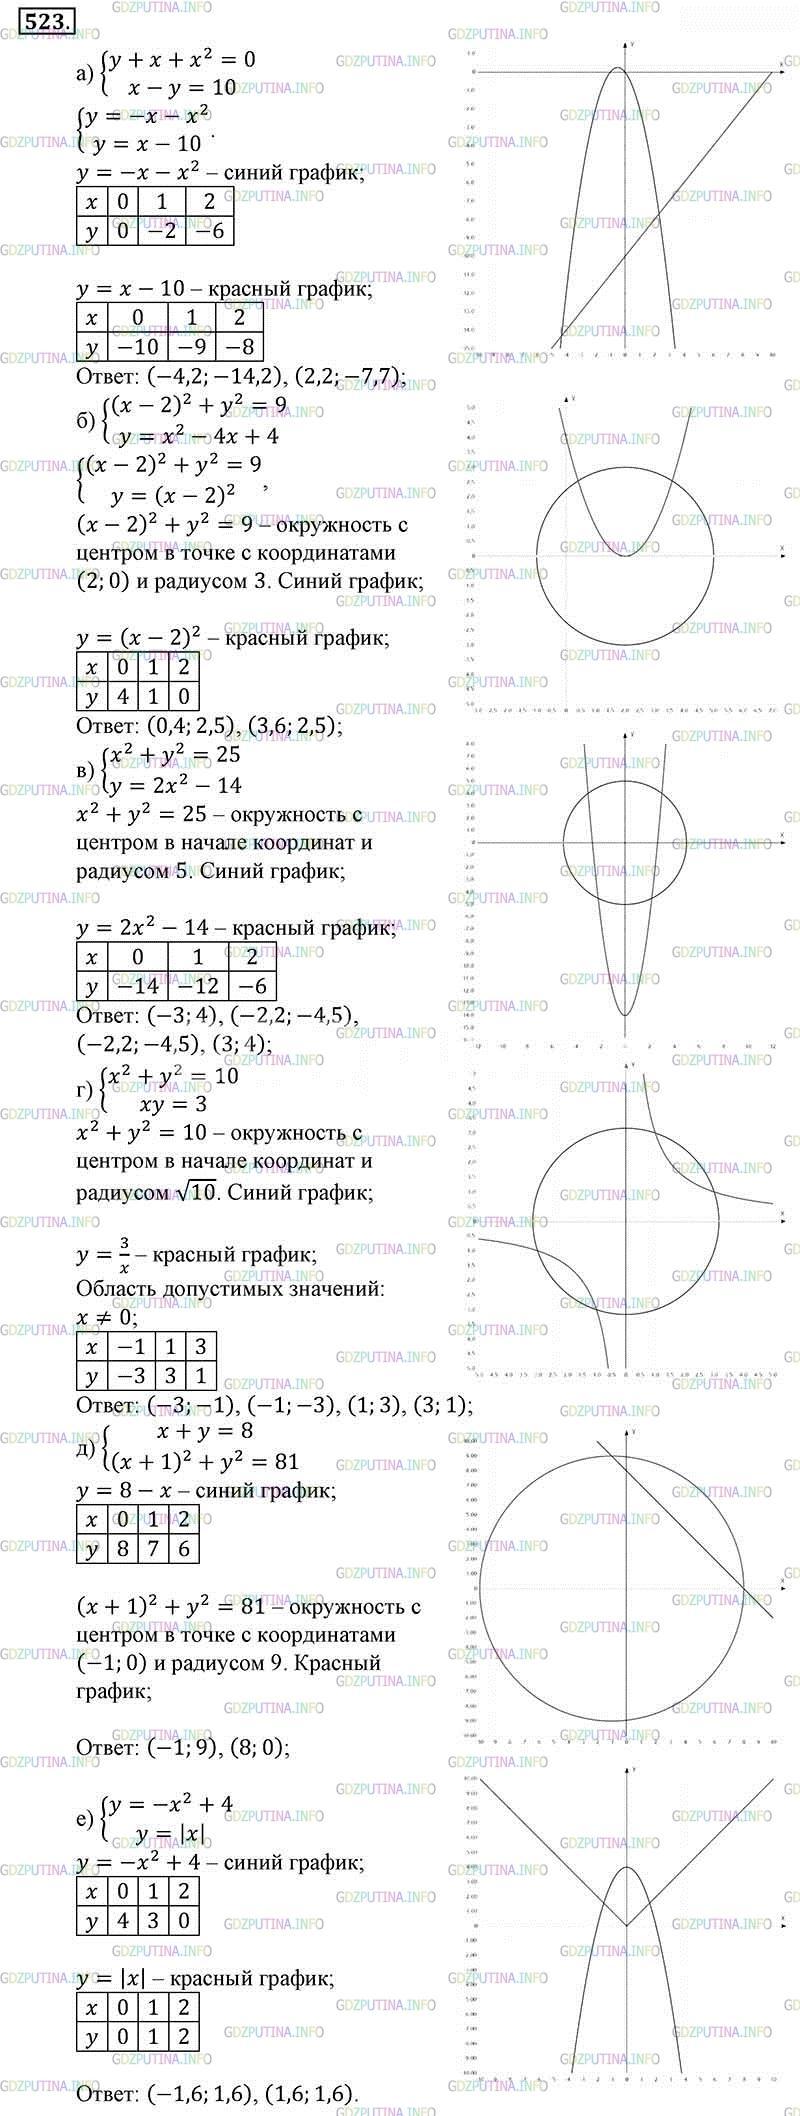 Номер № 422 гдз по алгебре 9 класс: макарычев.